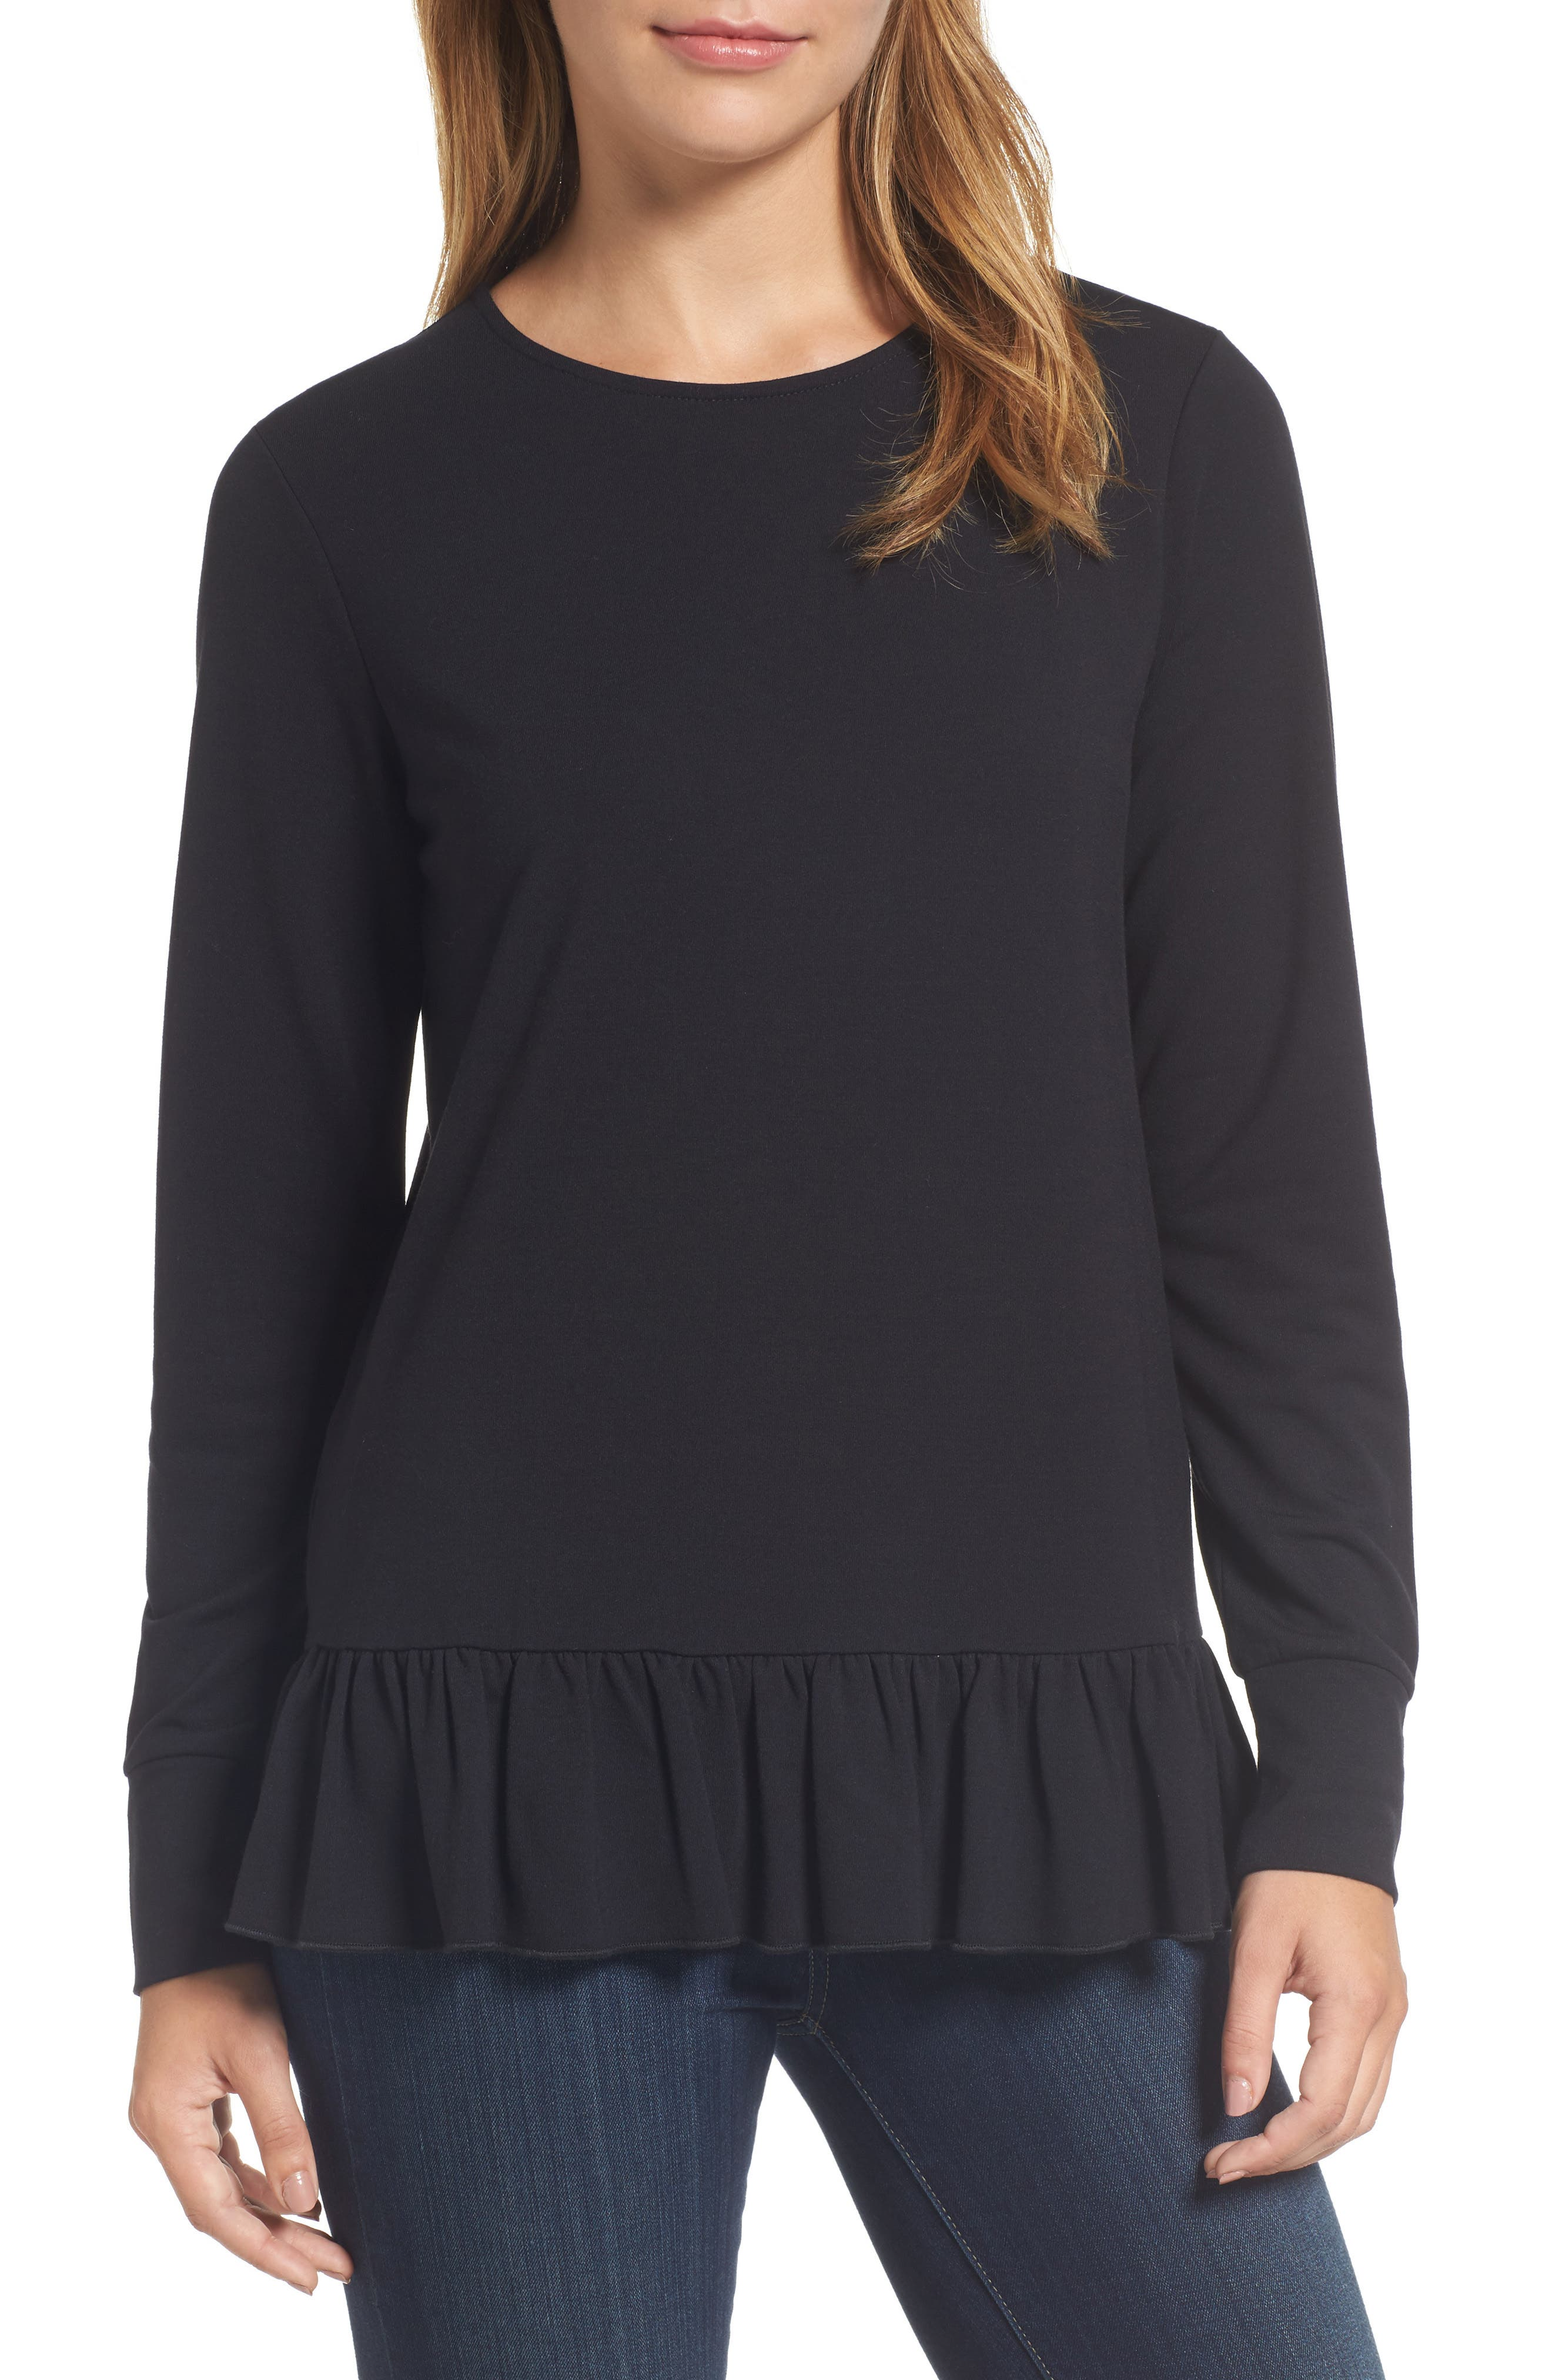 Alternate Image 1 Selected - Halogen® Ruffle Hem Sweatshirt (Regular & Petite)